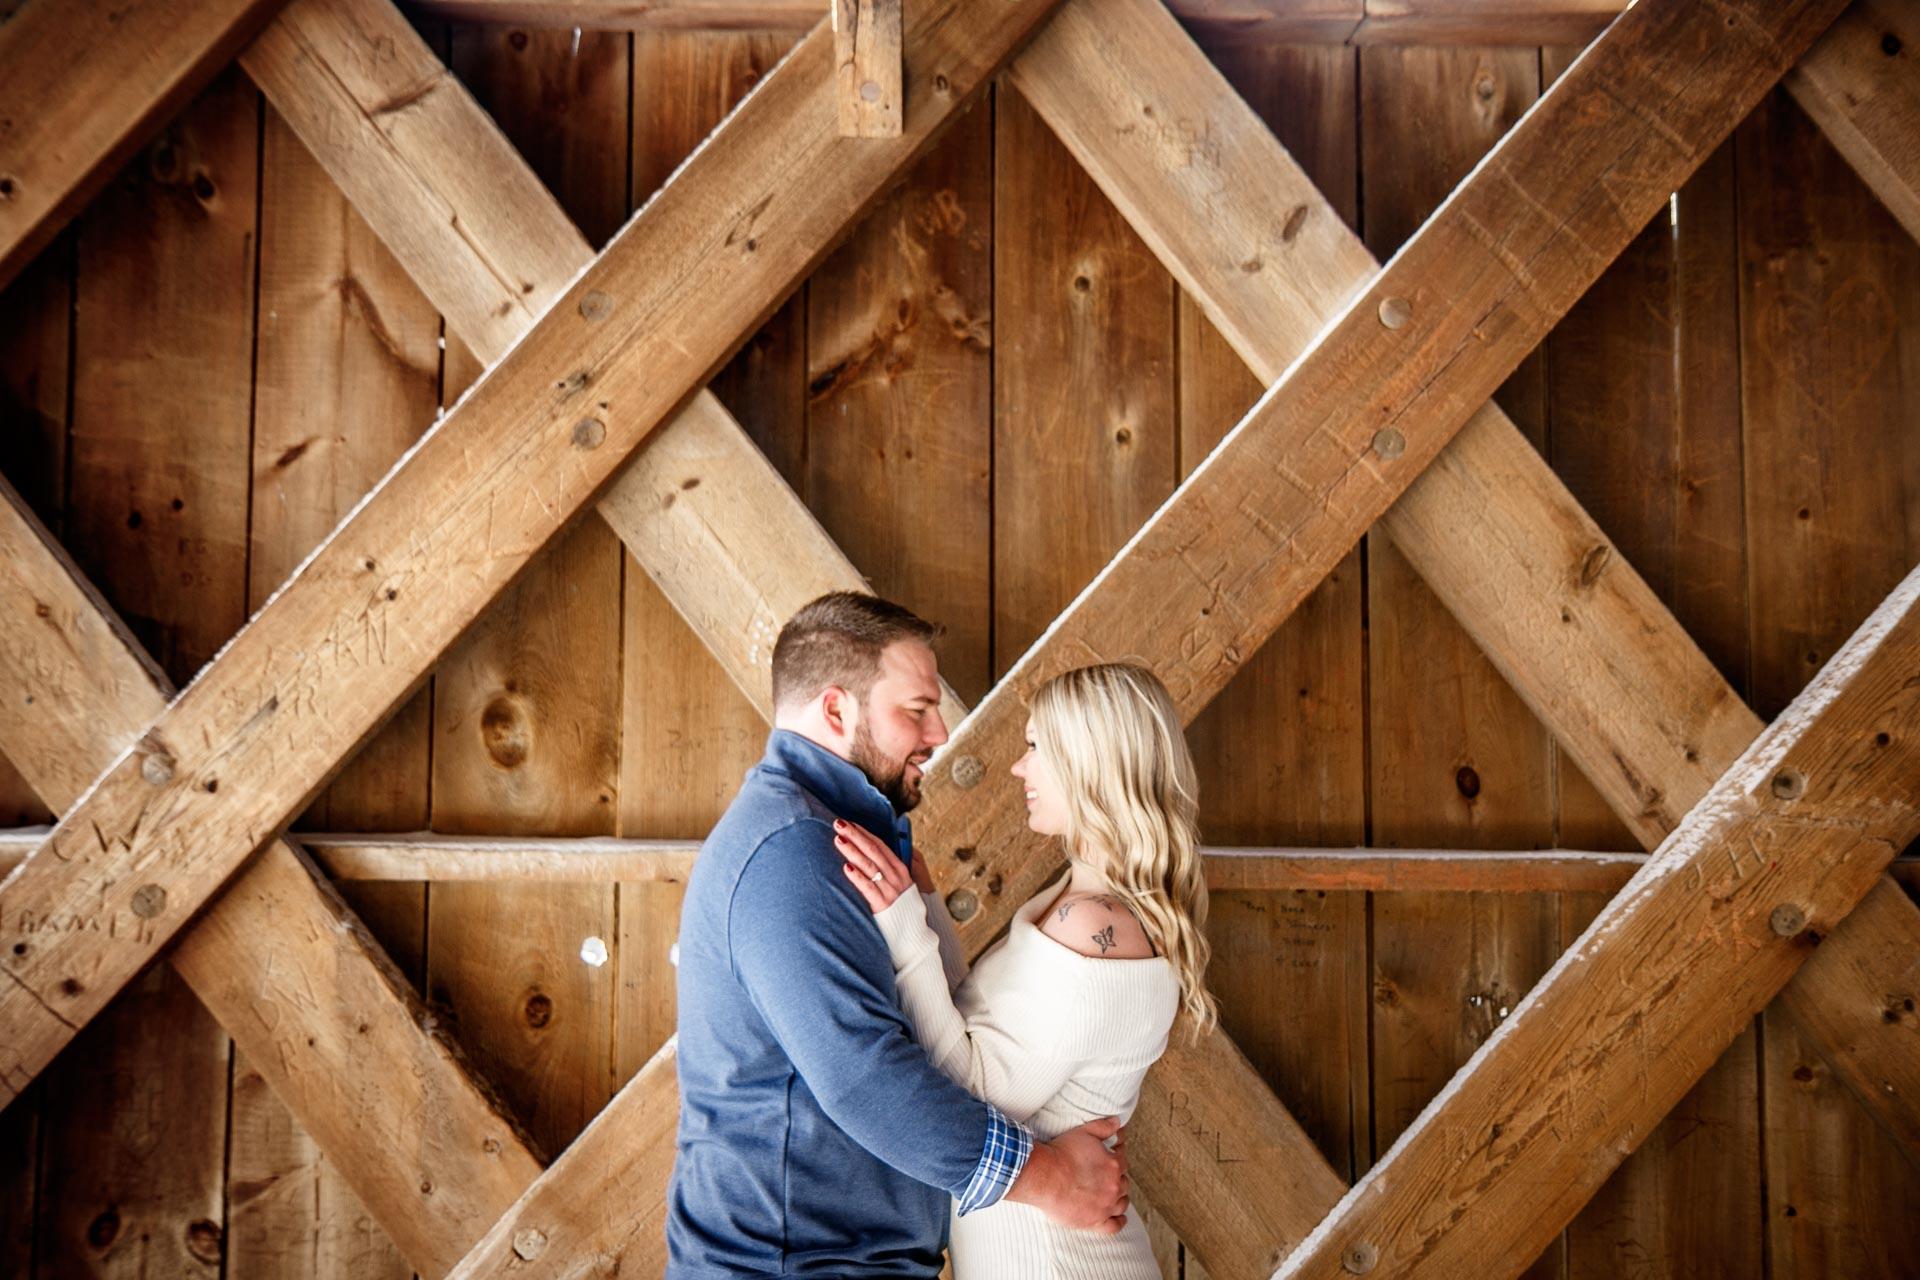 rachel-john-engagement-covered-bridge-park-cedarburgi-wi-adam-shea-photography-green-bay-appleton-neenah-photographer-11.jpg